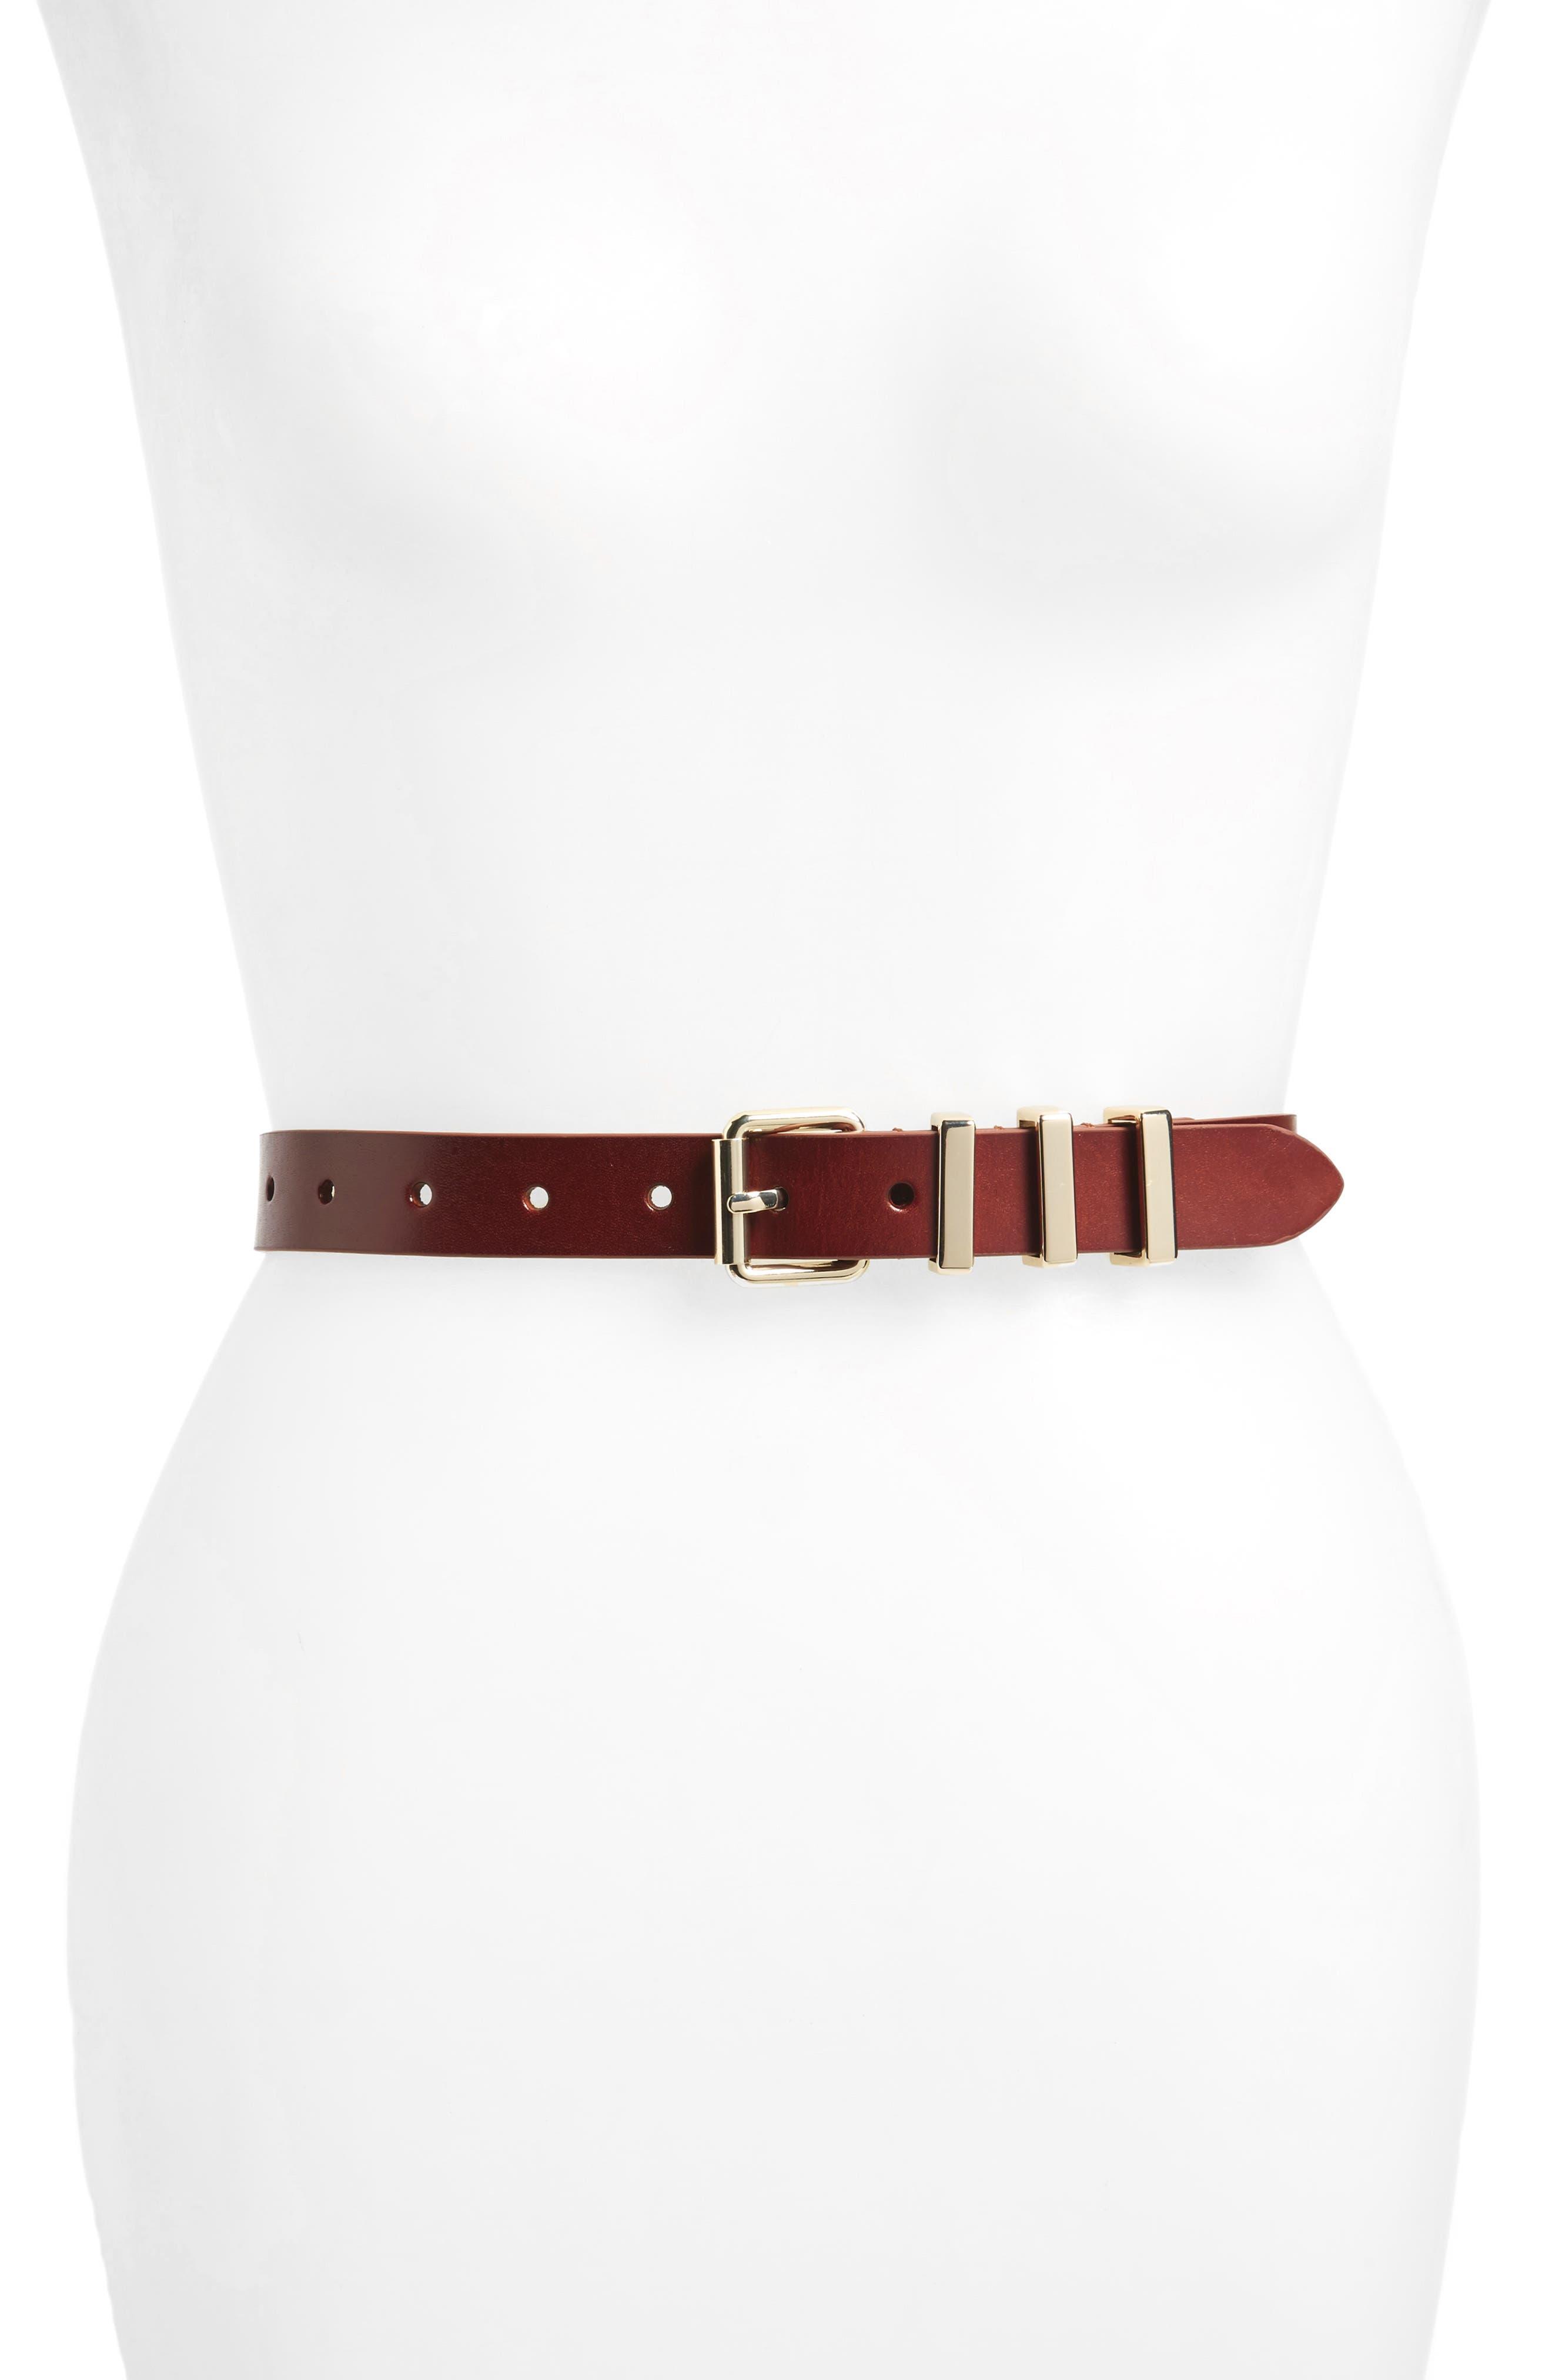 REBECCA MINKOFF Suzy Leather Belt, Main, color, LUGGAGE